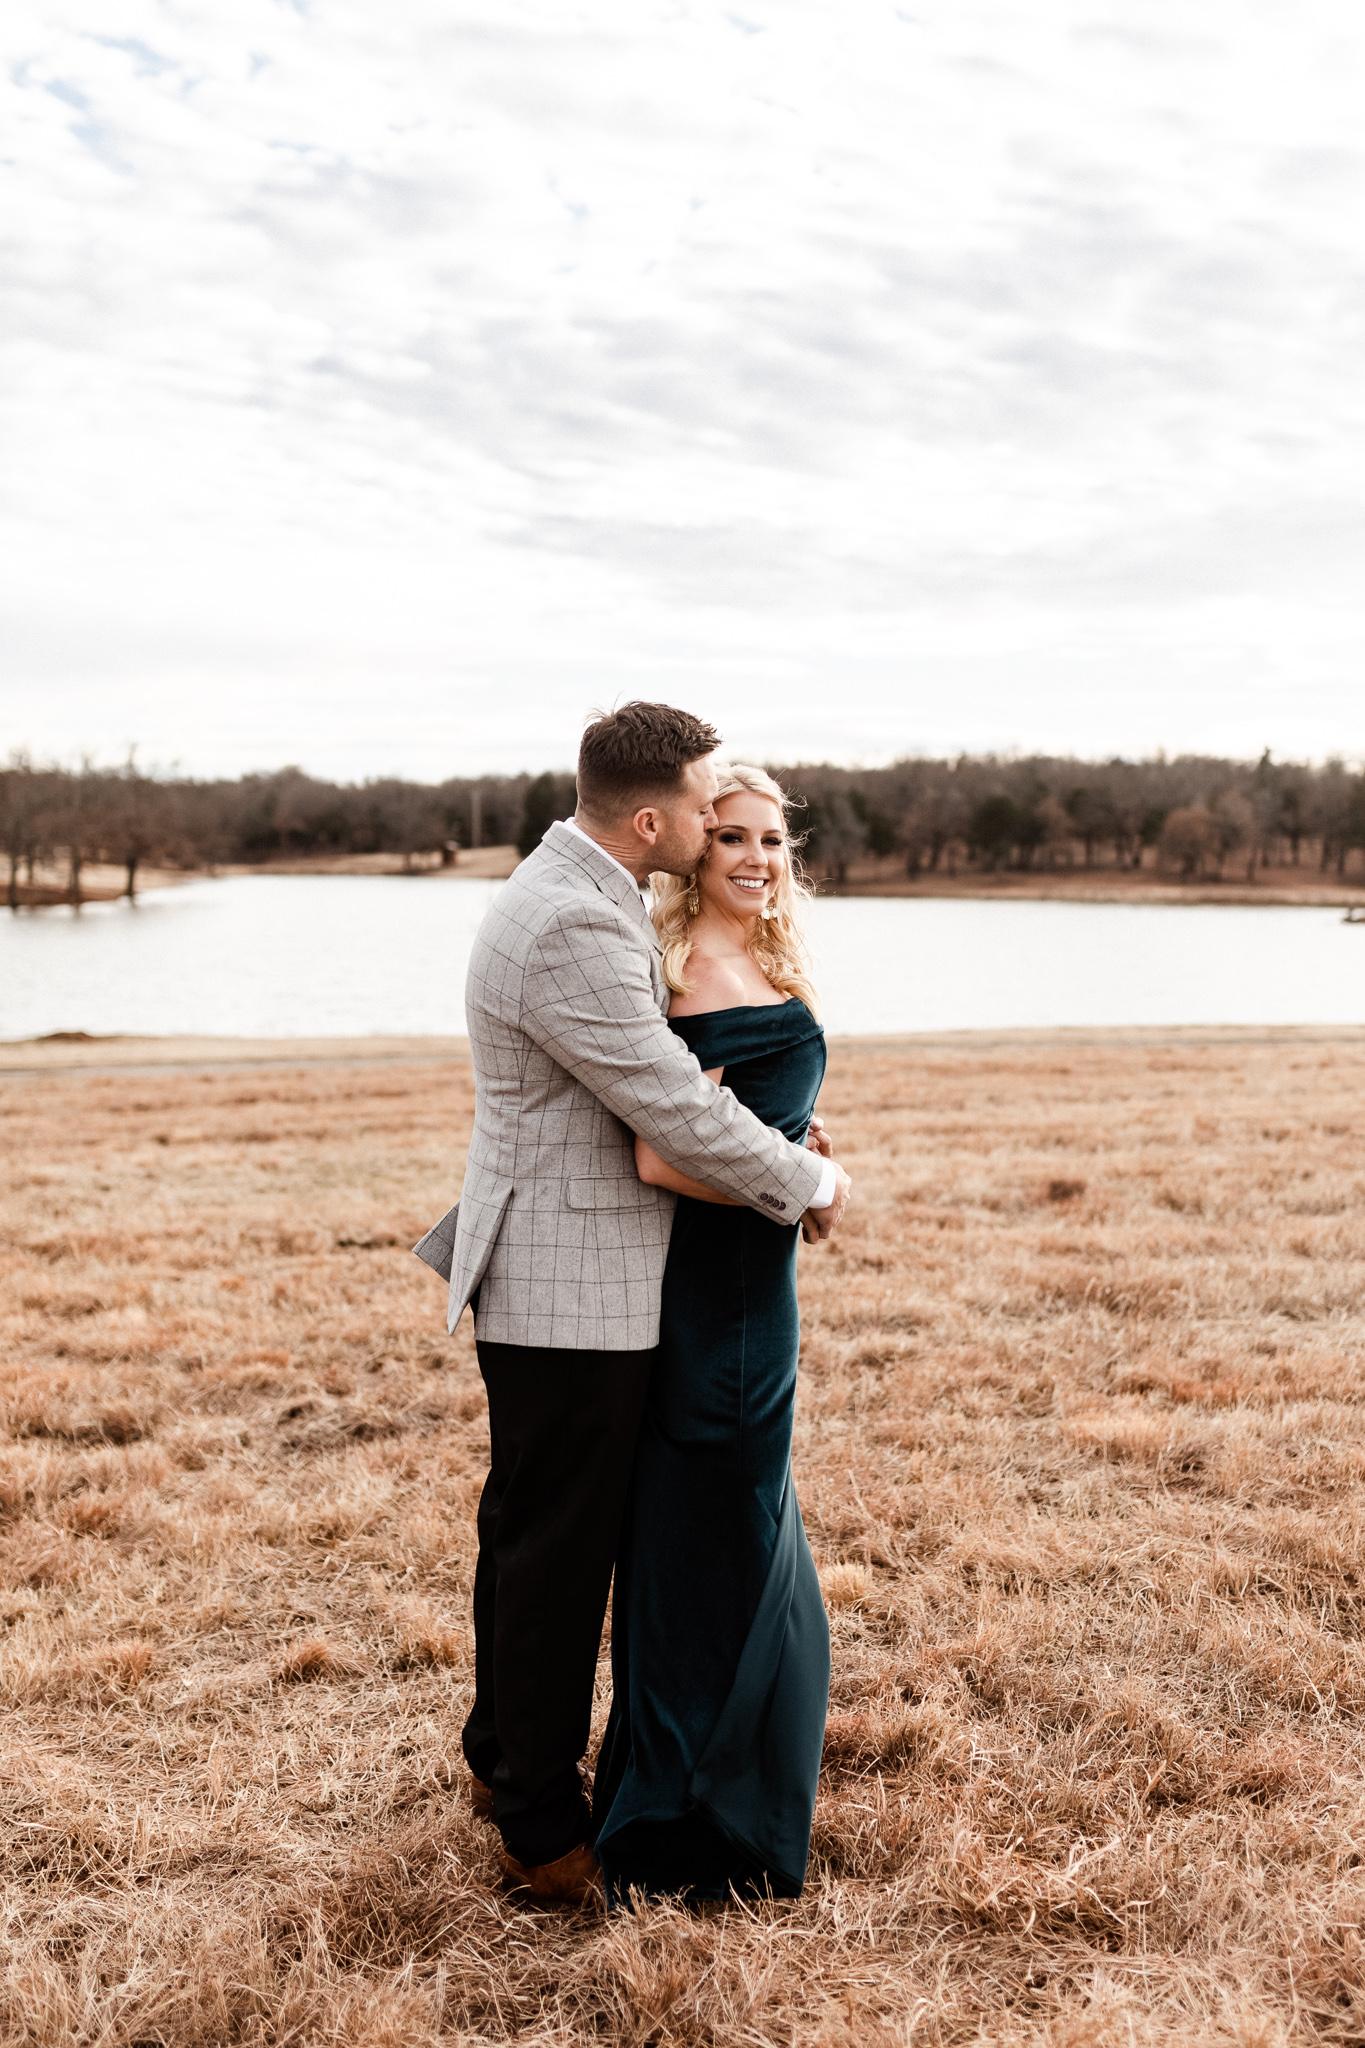 Wade + Stephanie | Warm Open Field Engagements | Oklahoma Wedding Photographer-14.jpg